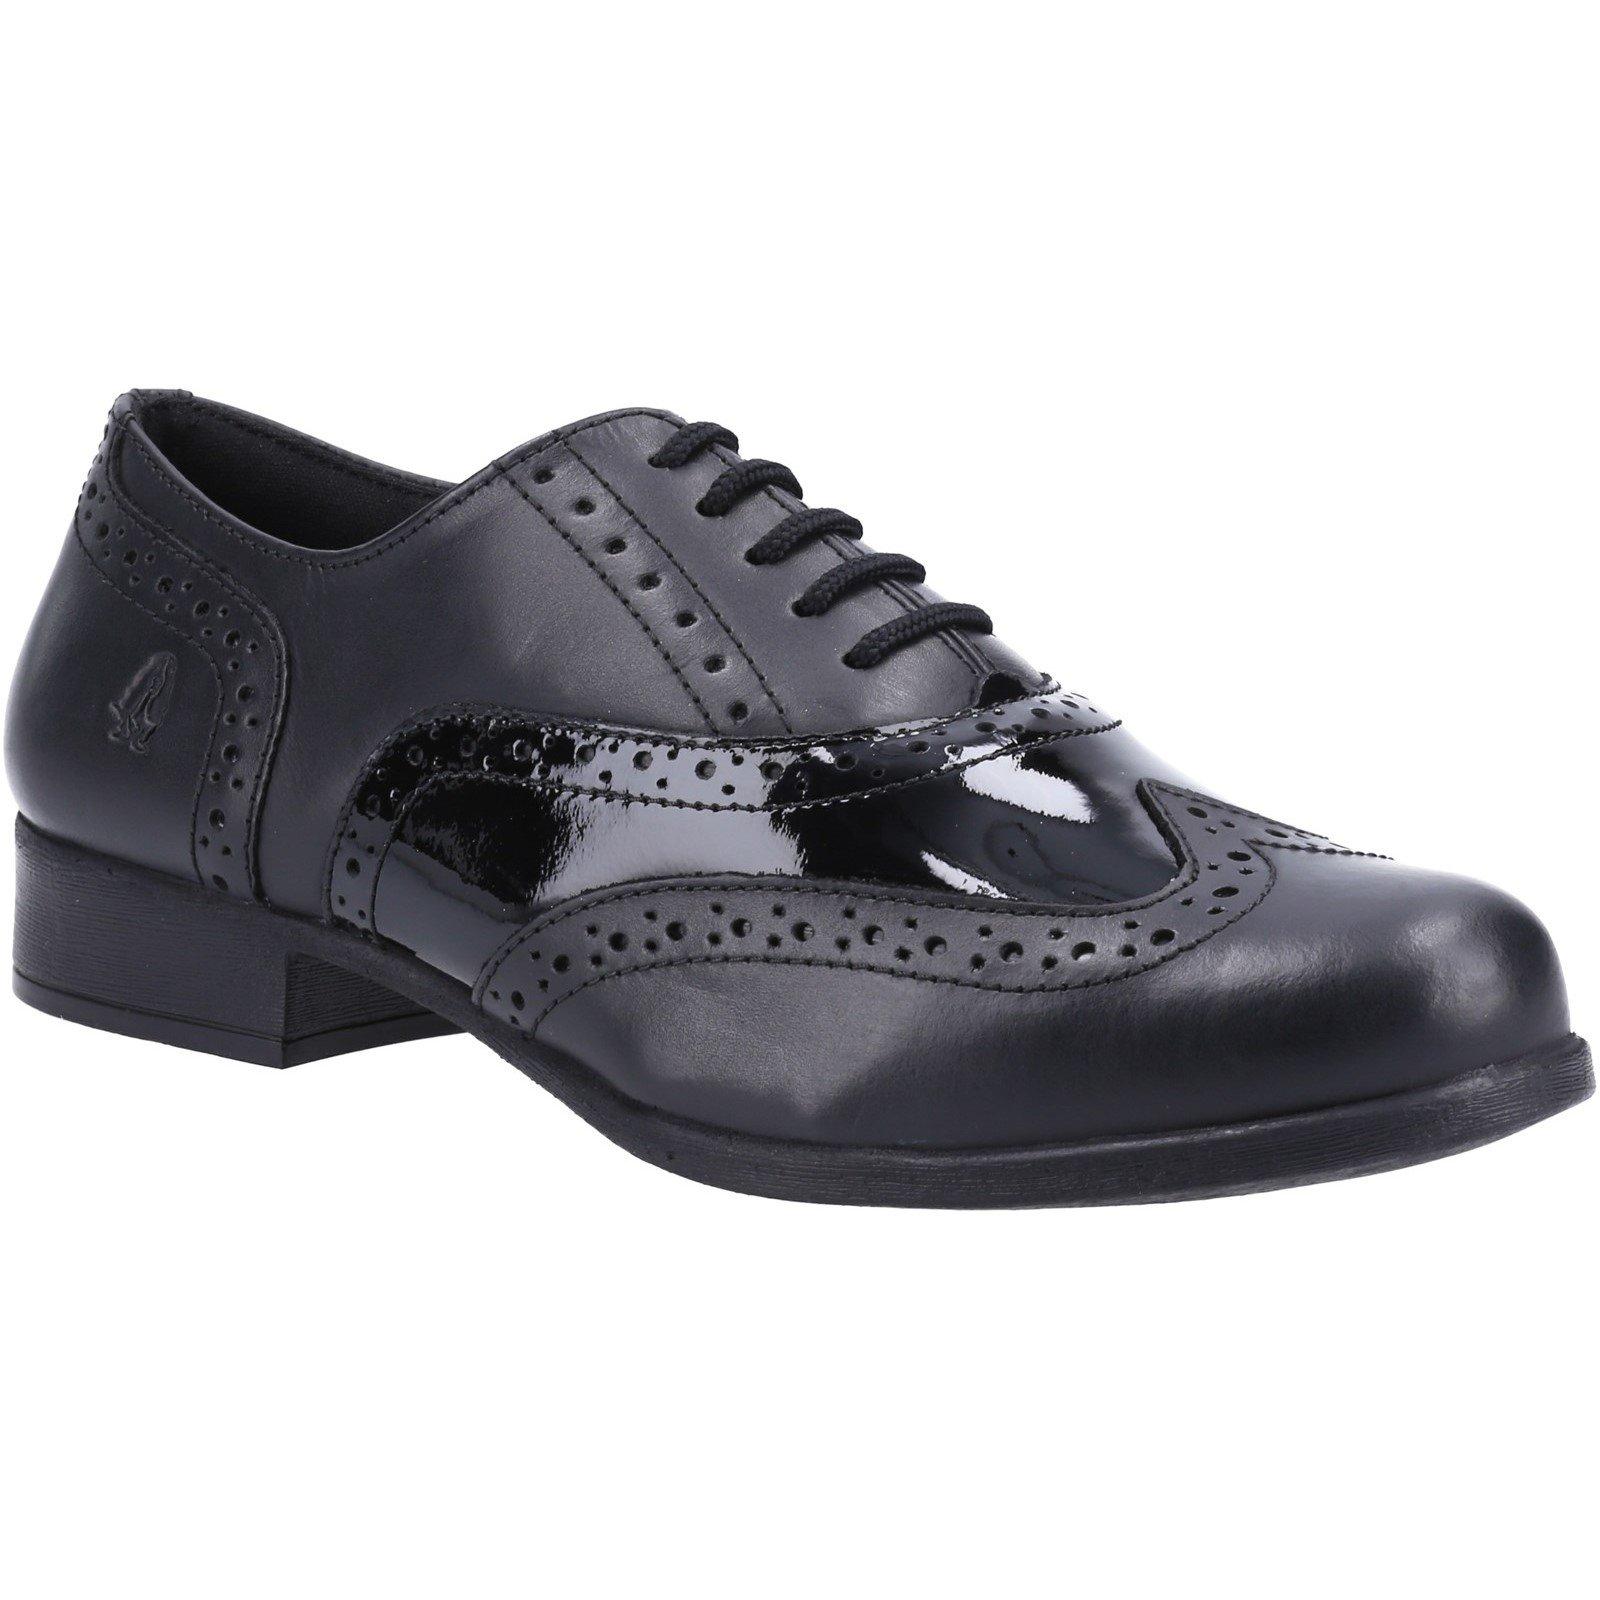 Hush Puppies Kid's Kada Senior School Brogue Shoe Black 33193 - Black 8